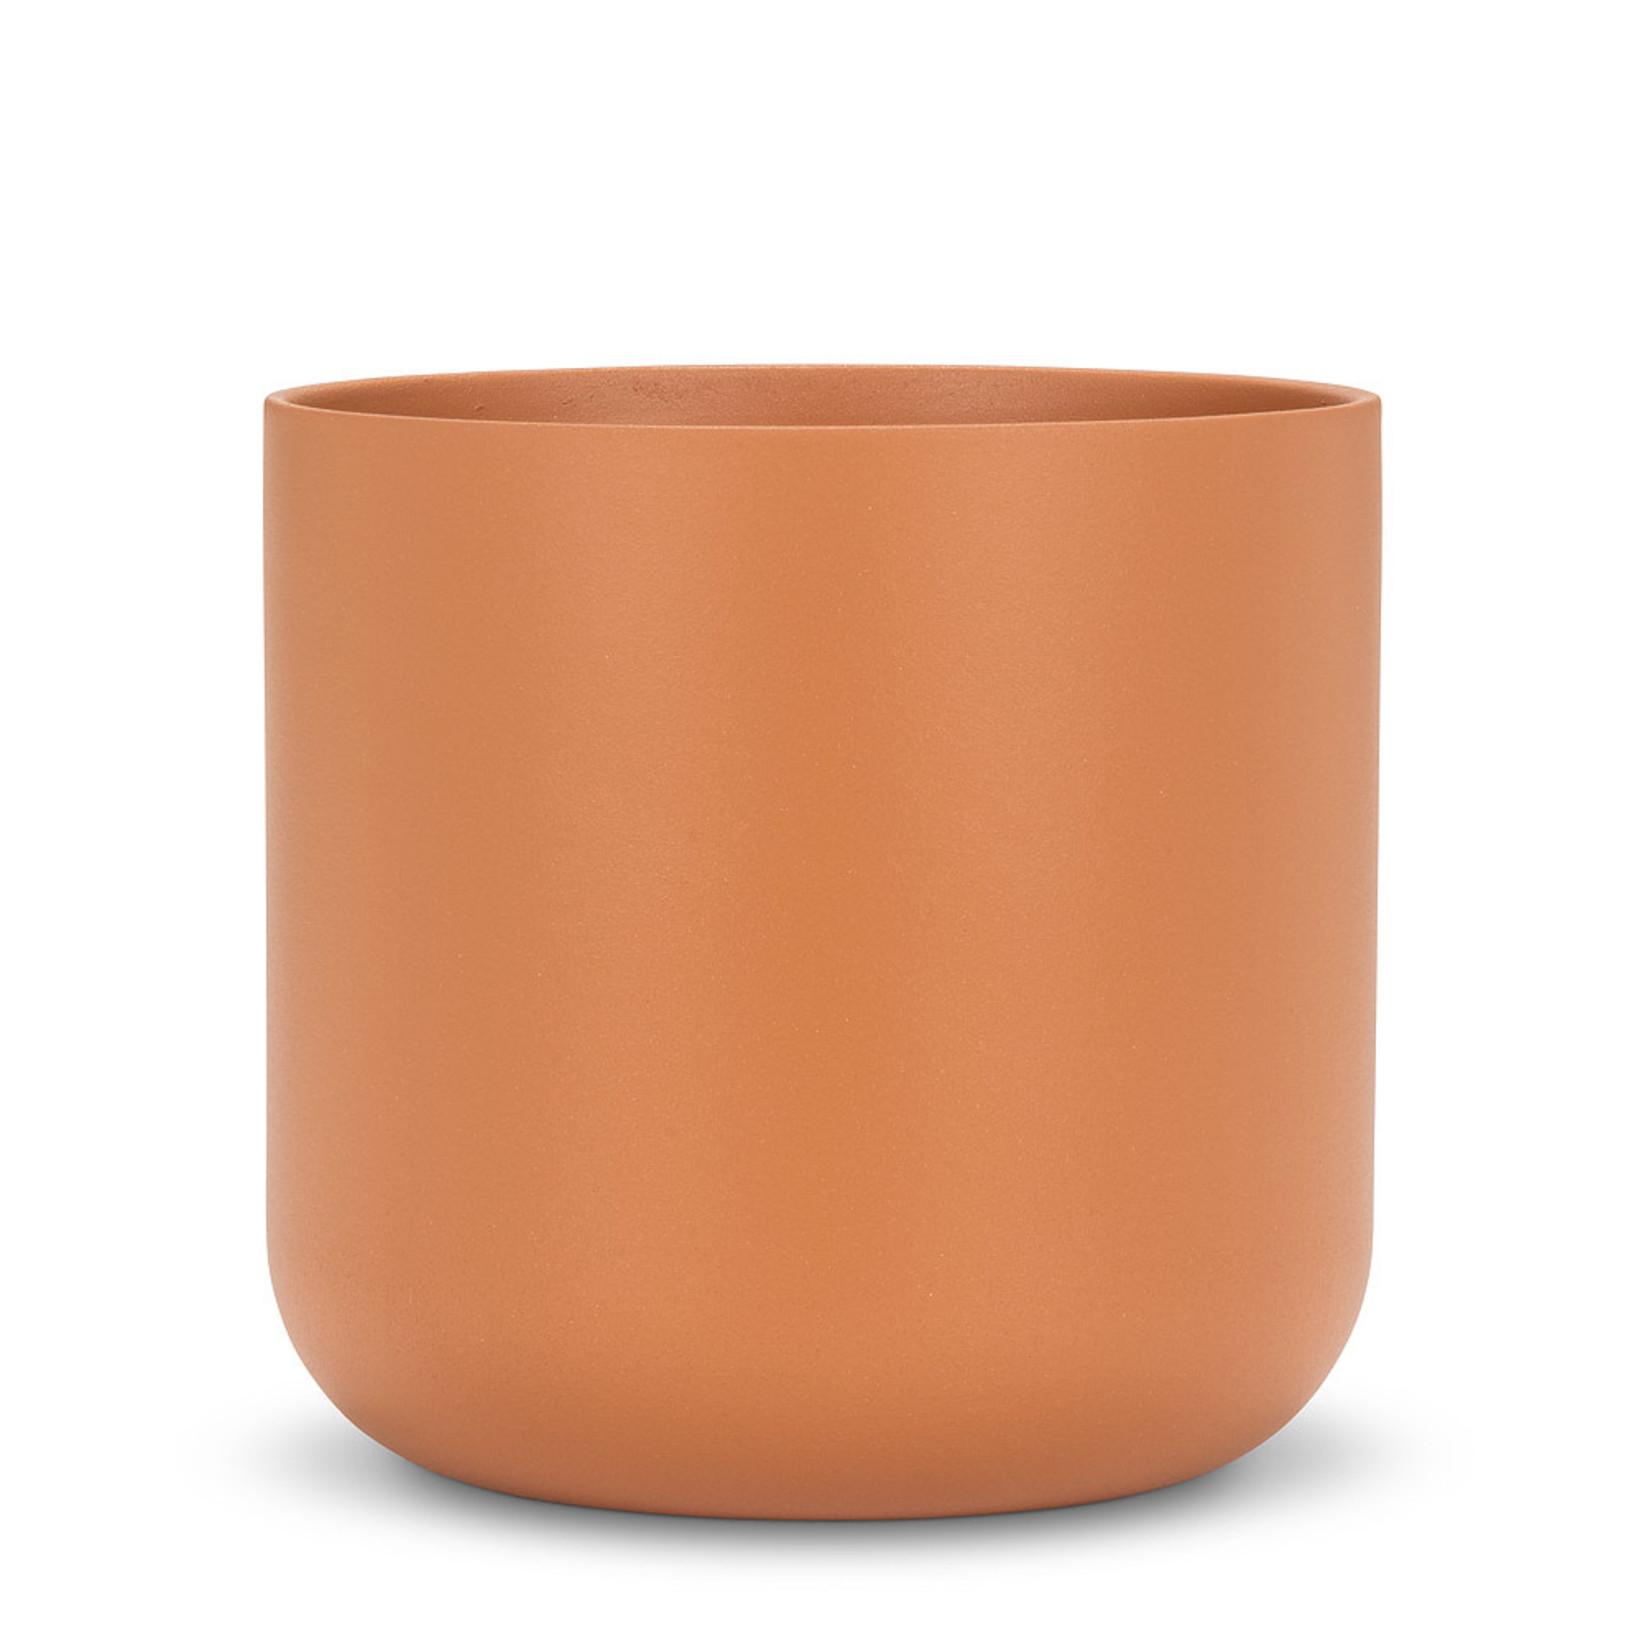 Abbott Cache-pot ORANGO - Large